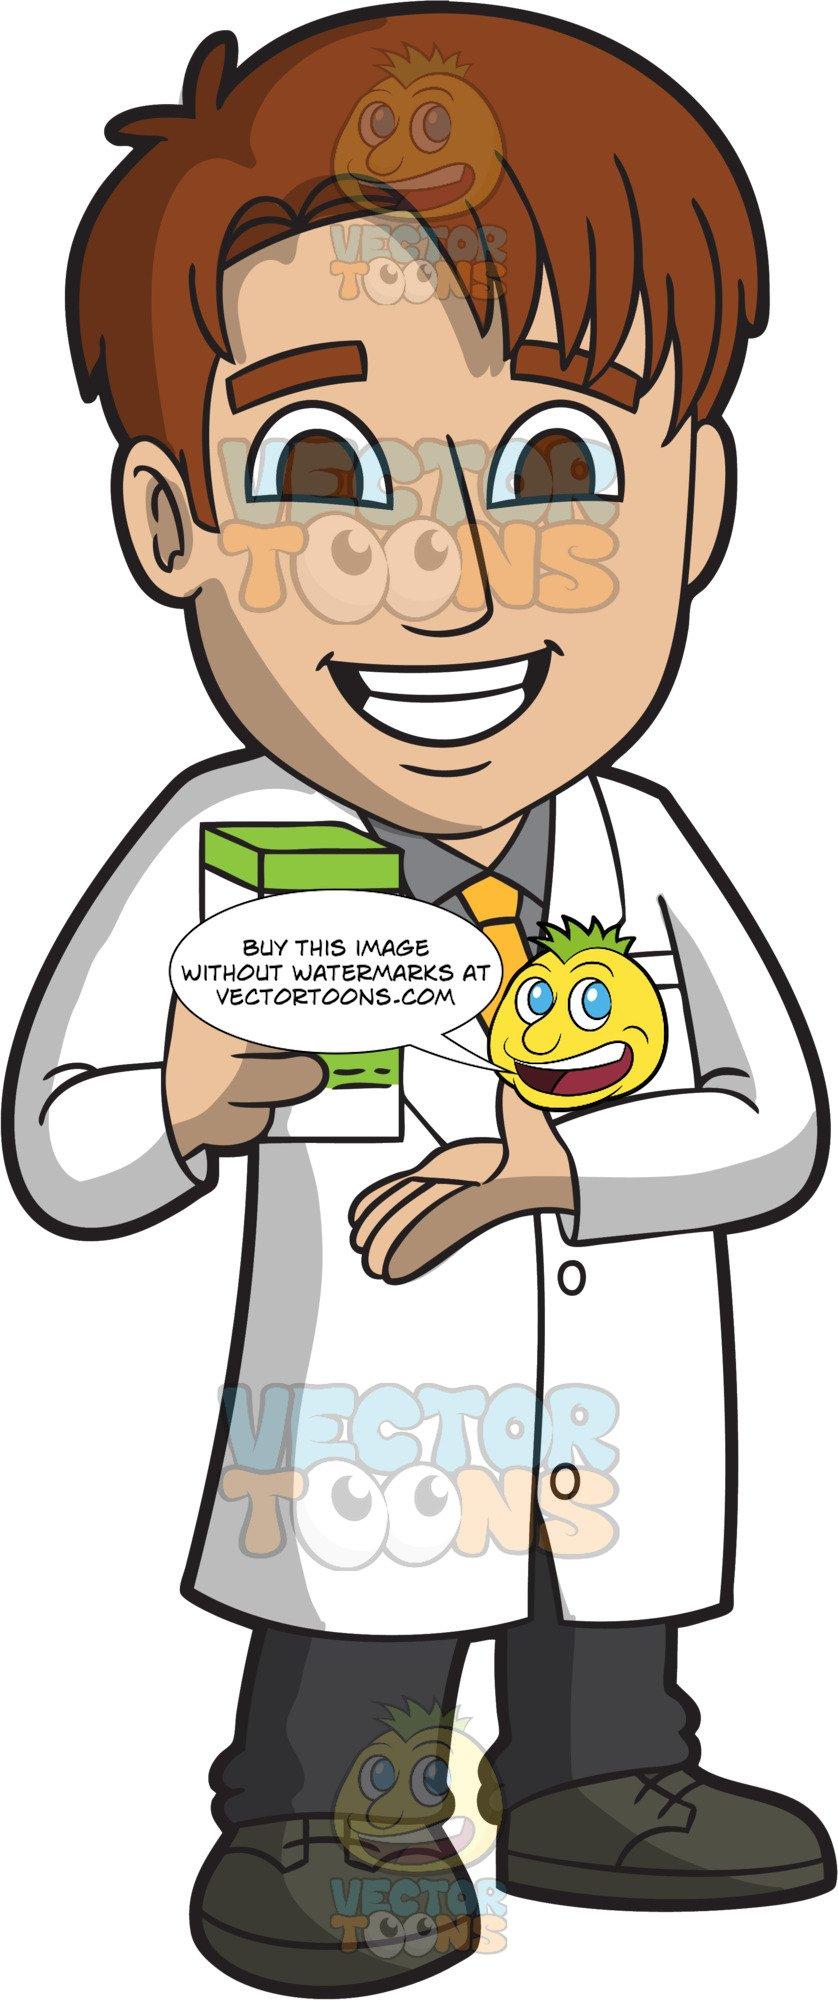 Pharmacy cartoon clipart png transparent library A Happy Male Pharmacist png transparent library